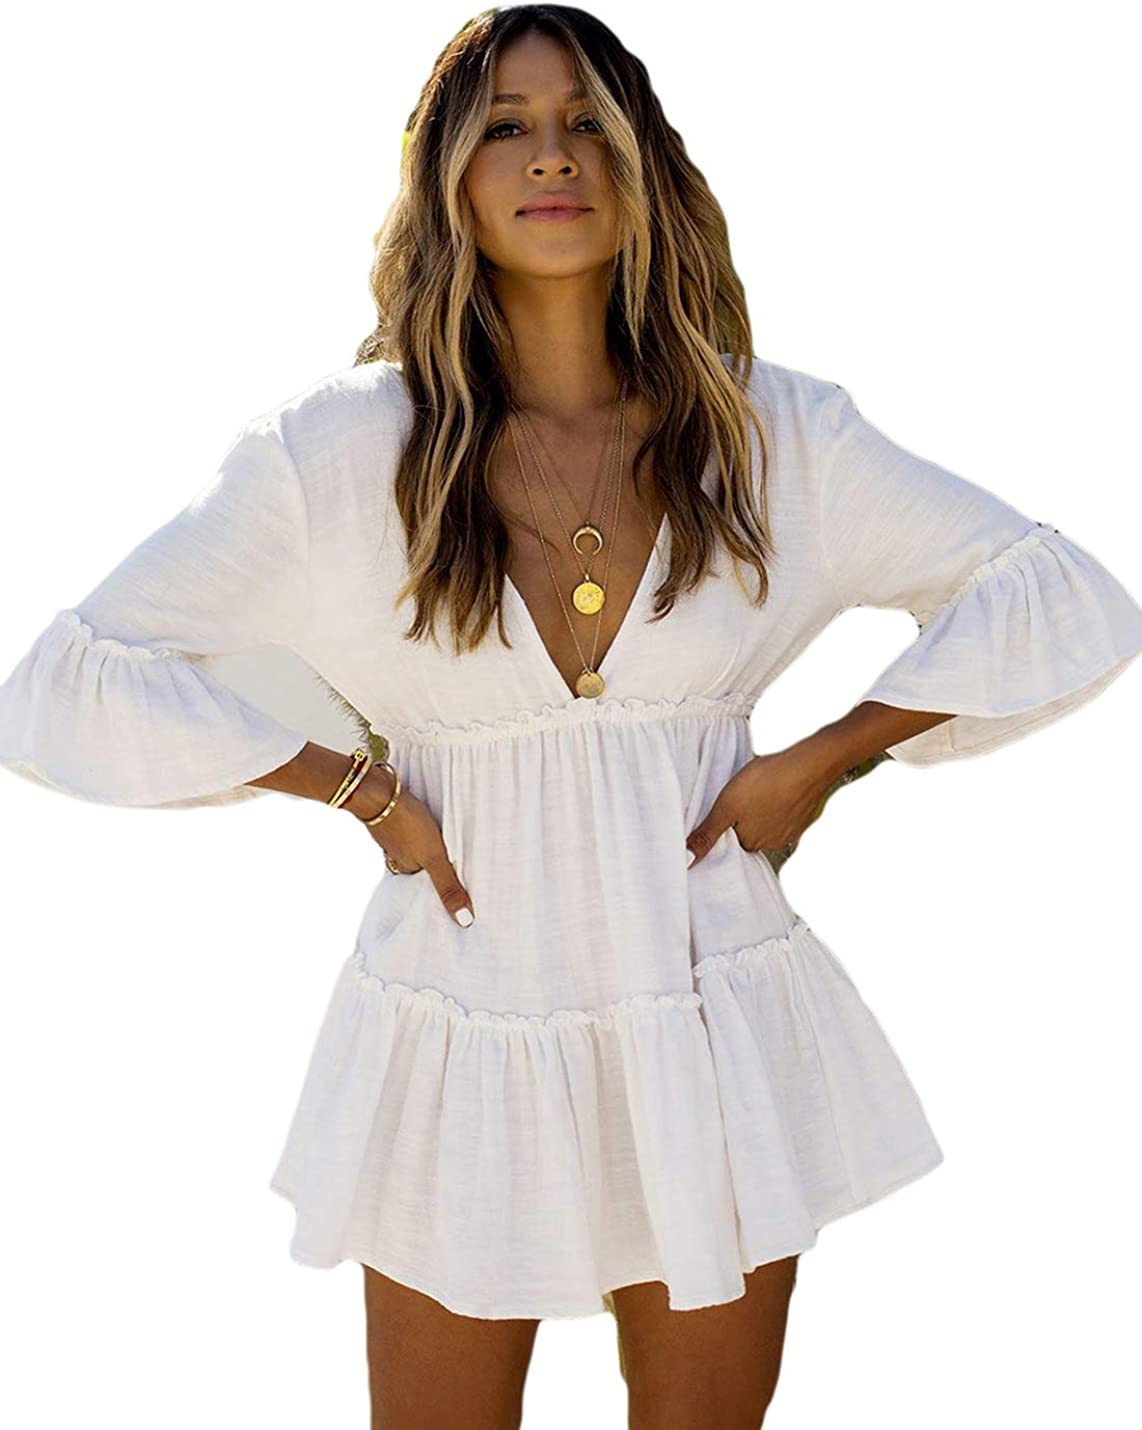 AILUNSNIKA Casual Swimsuit Cover Up for Women Loose Beach Bikini Dress